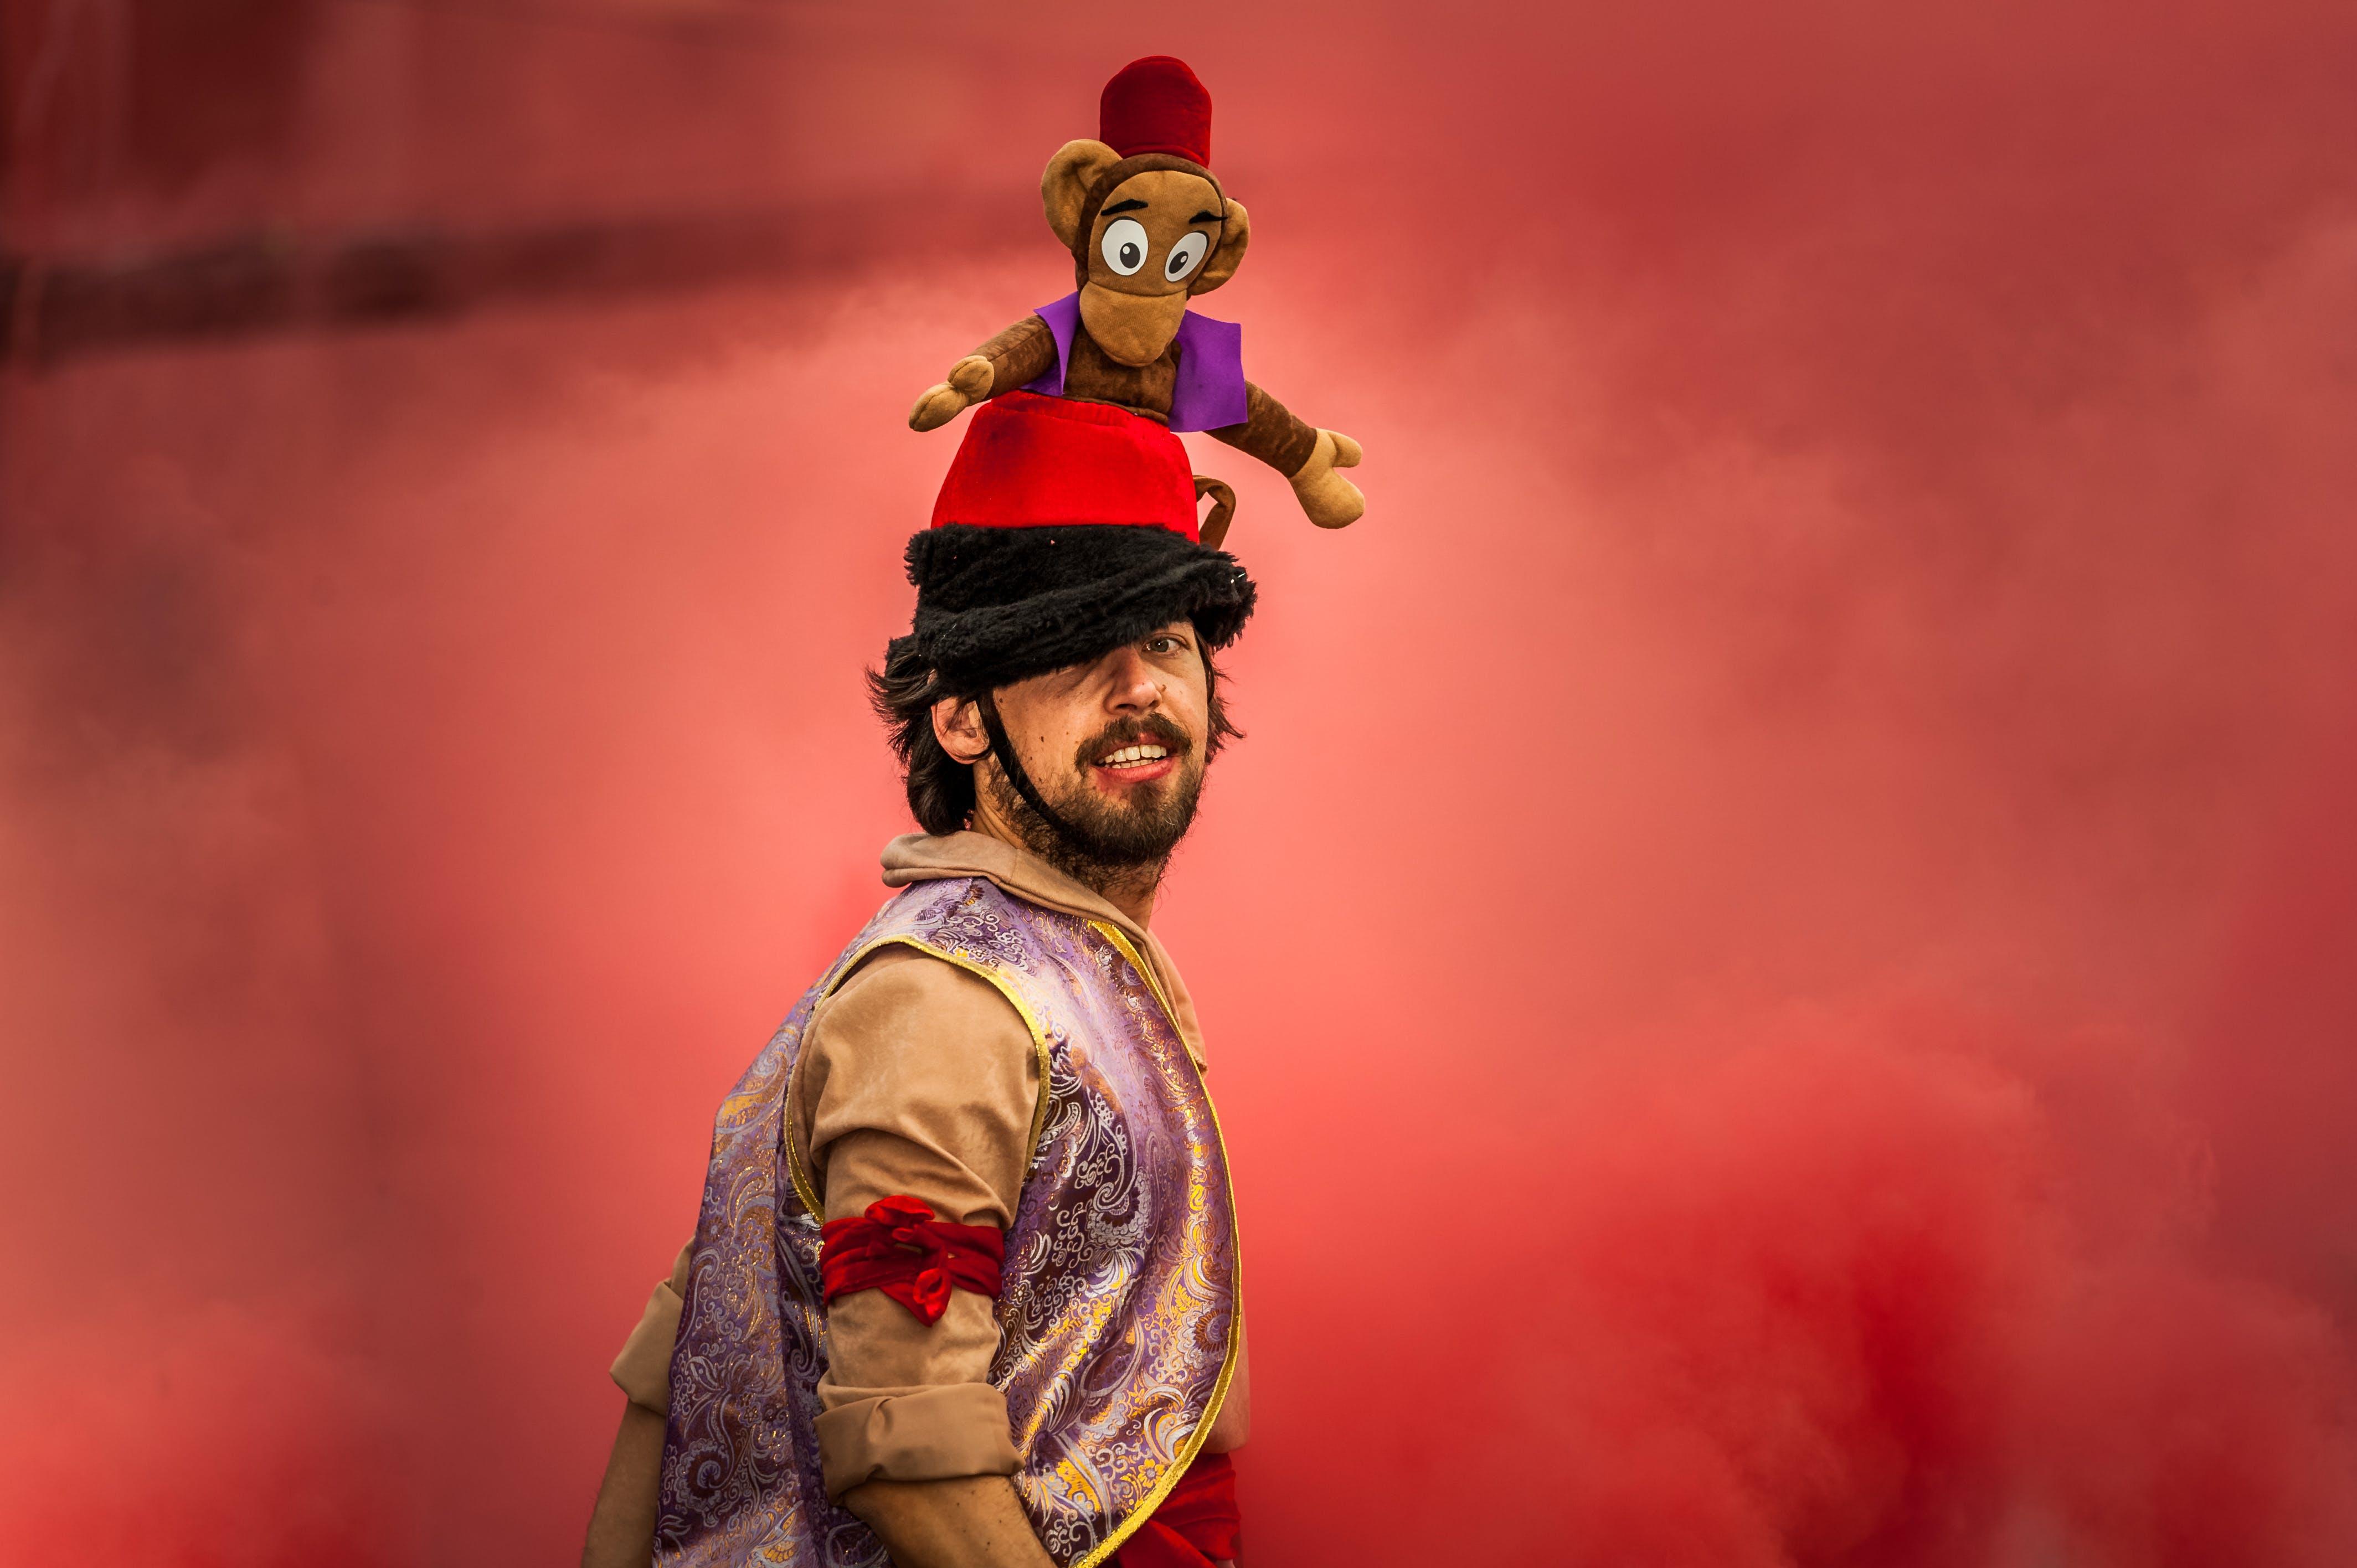 Man Wearing Aladdin Costume